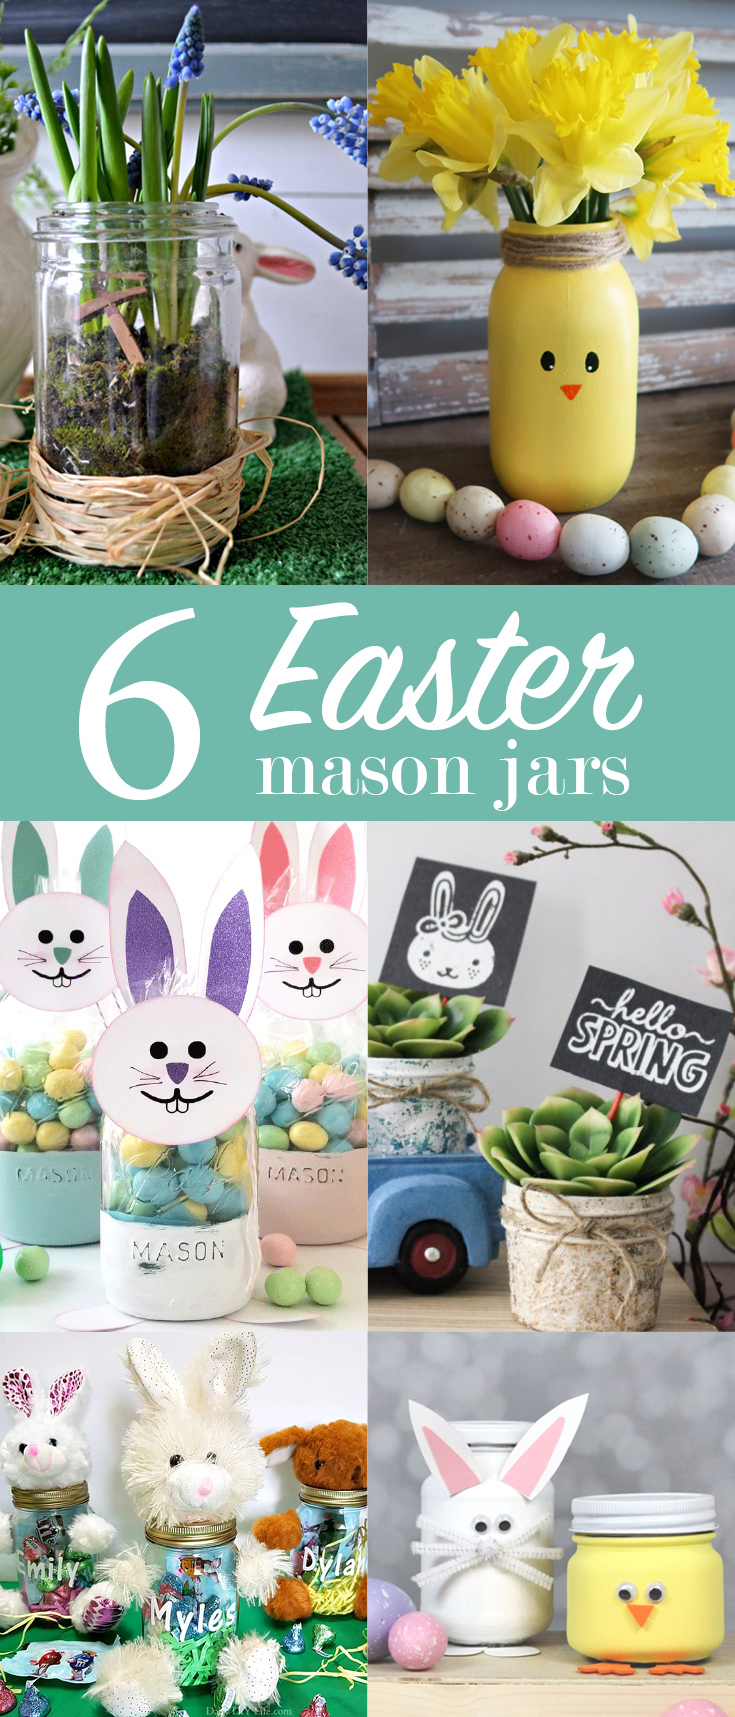 6 Easter Mason Jars